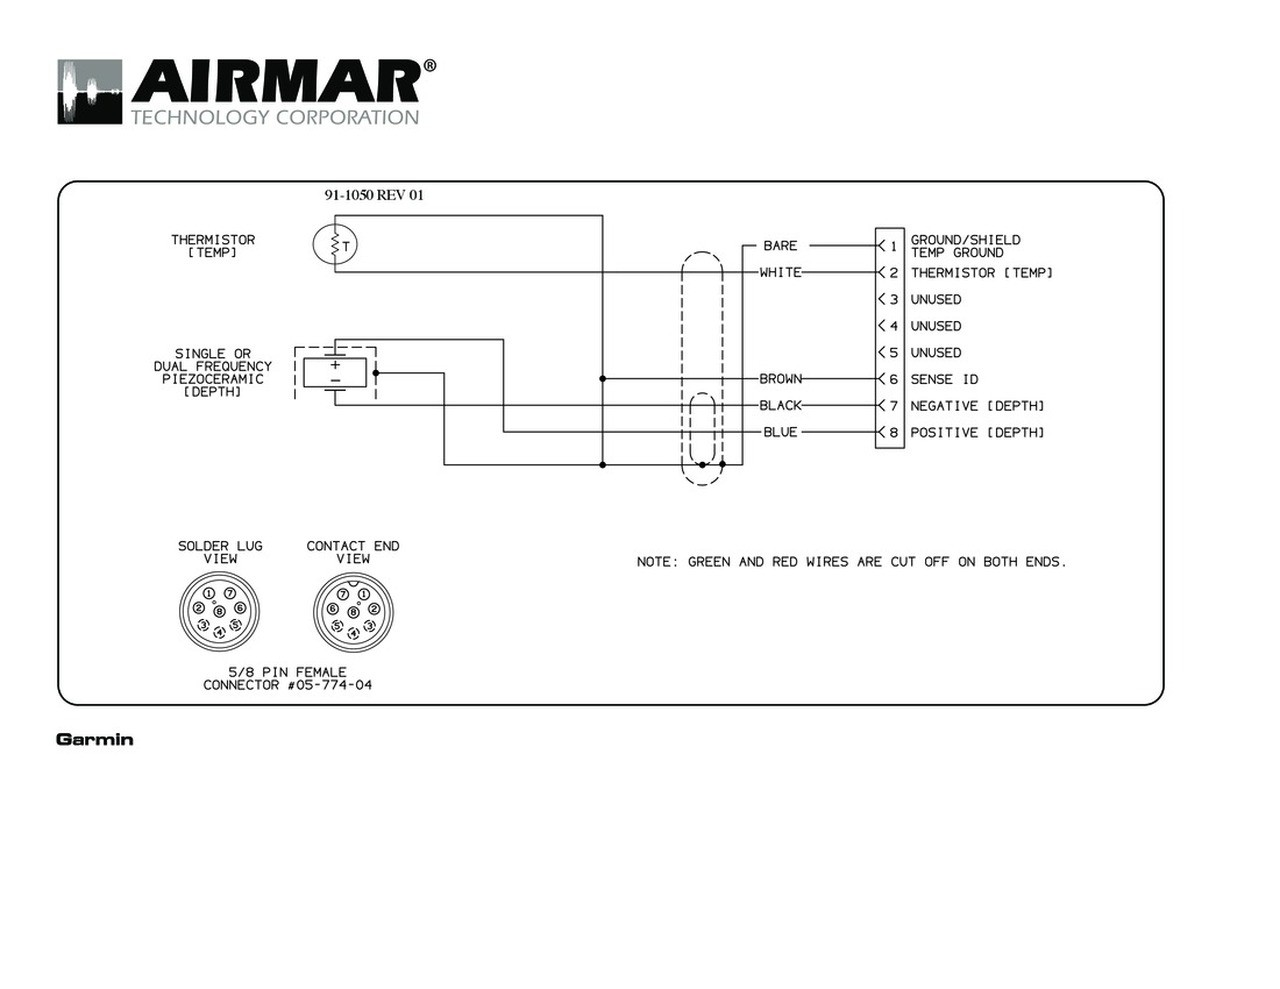 garmin transducer wiring diagramml